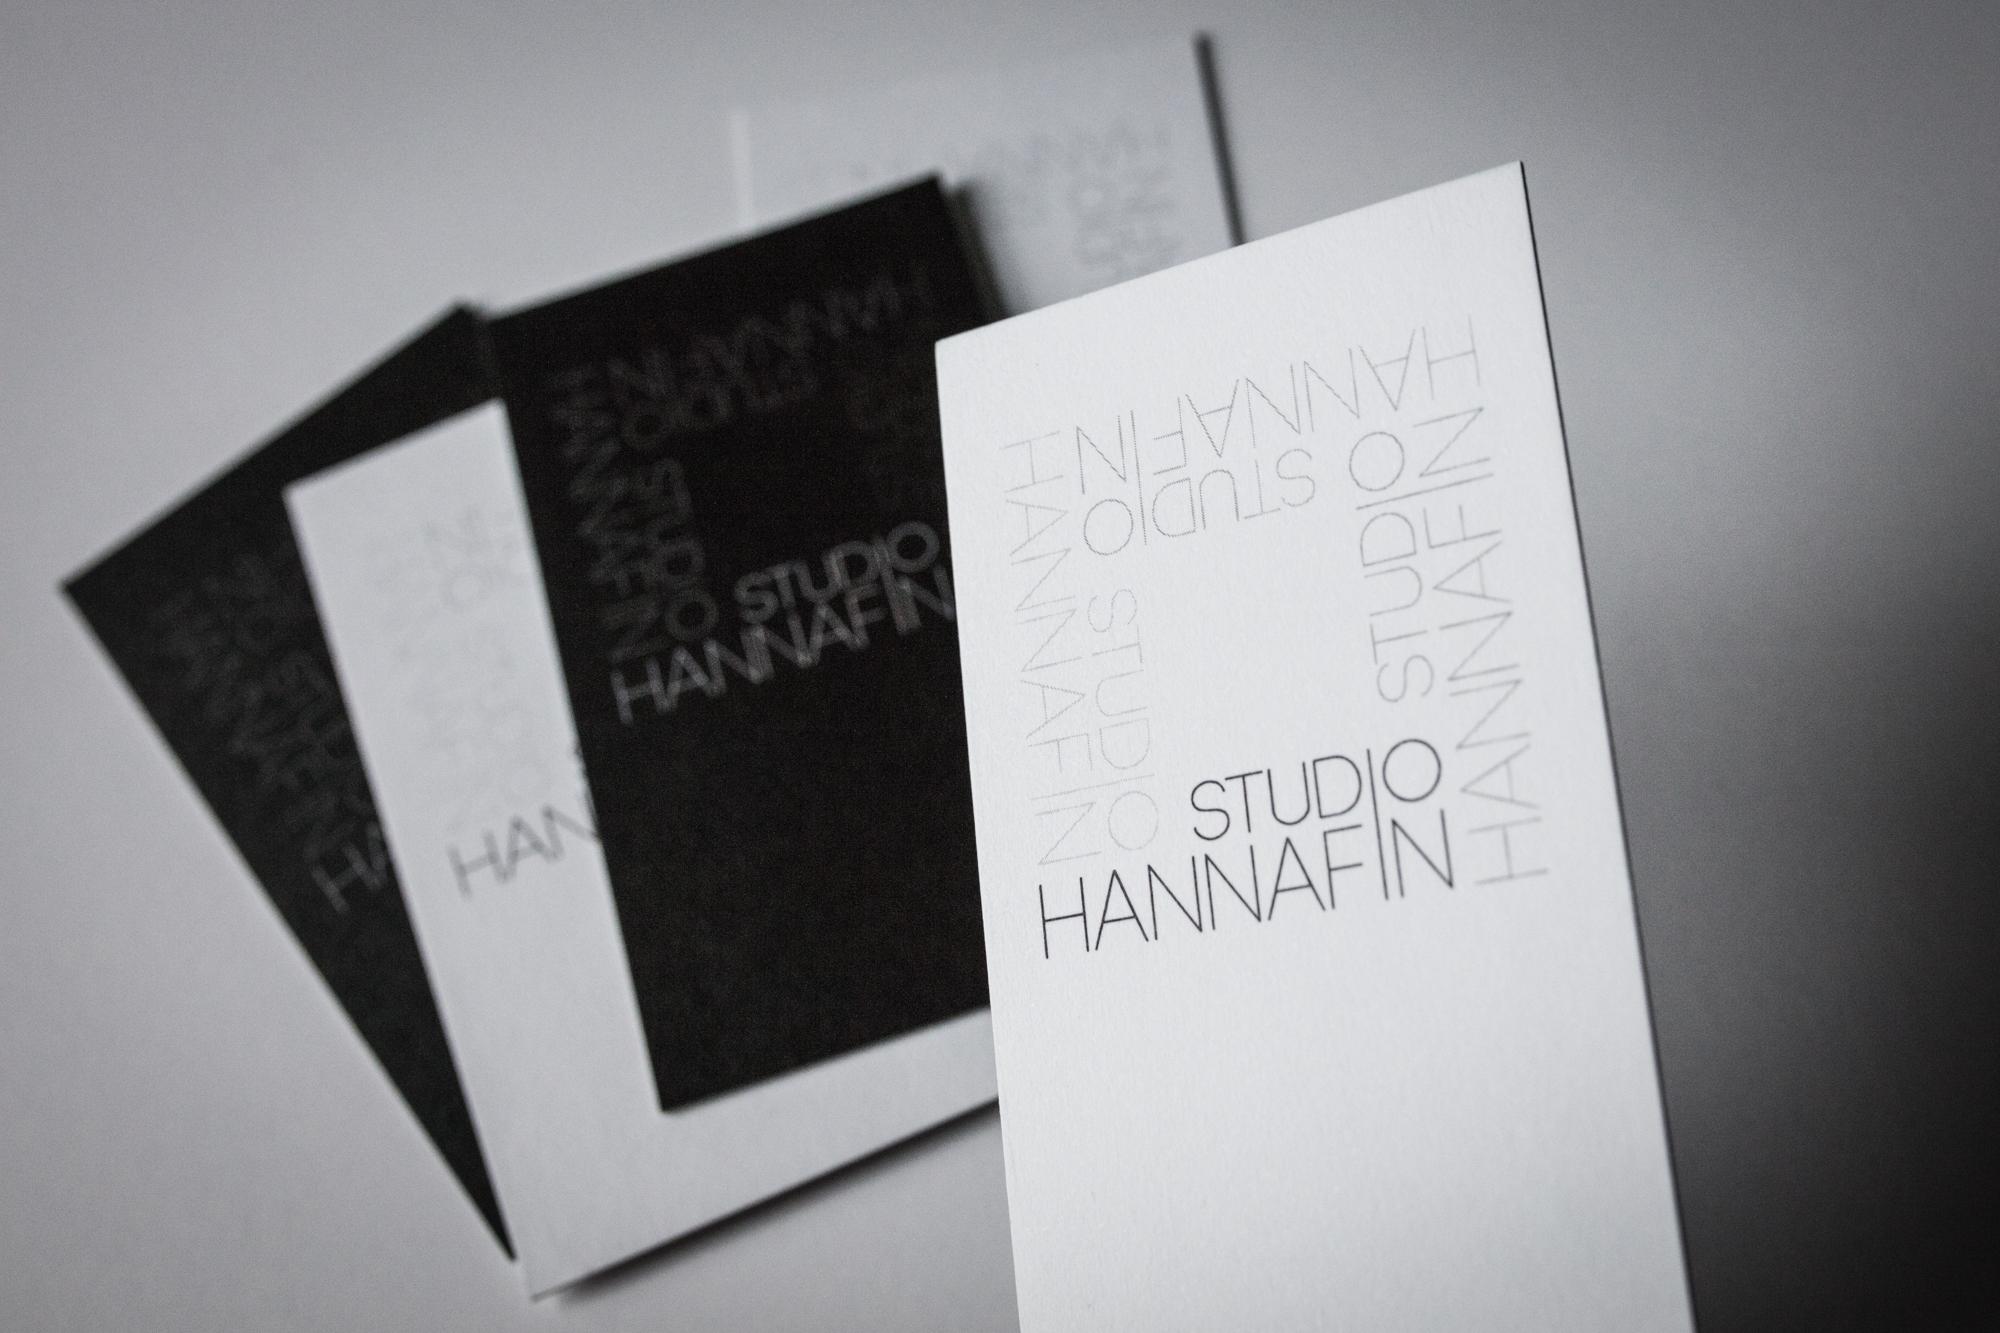 Business Card design by Creative Katz.